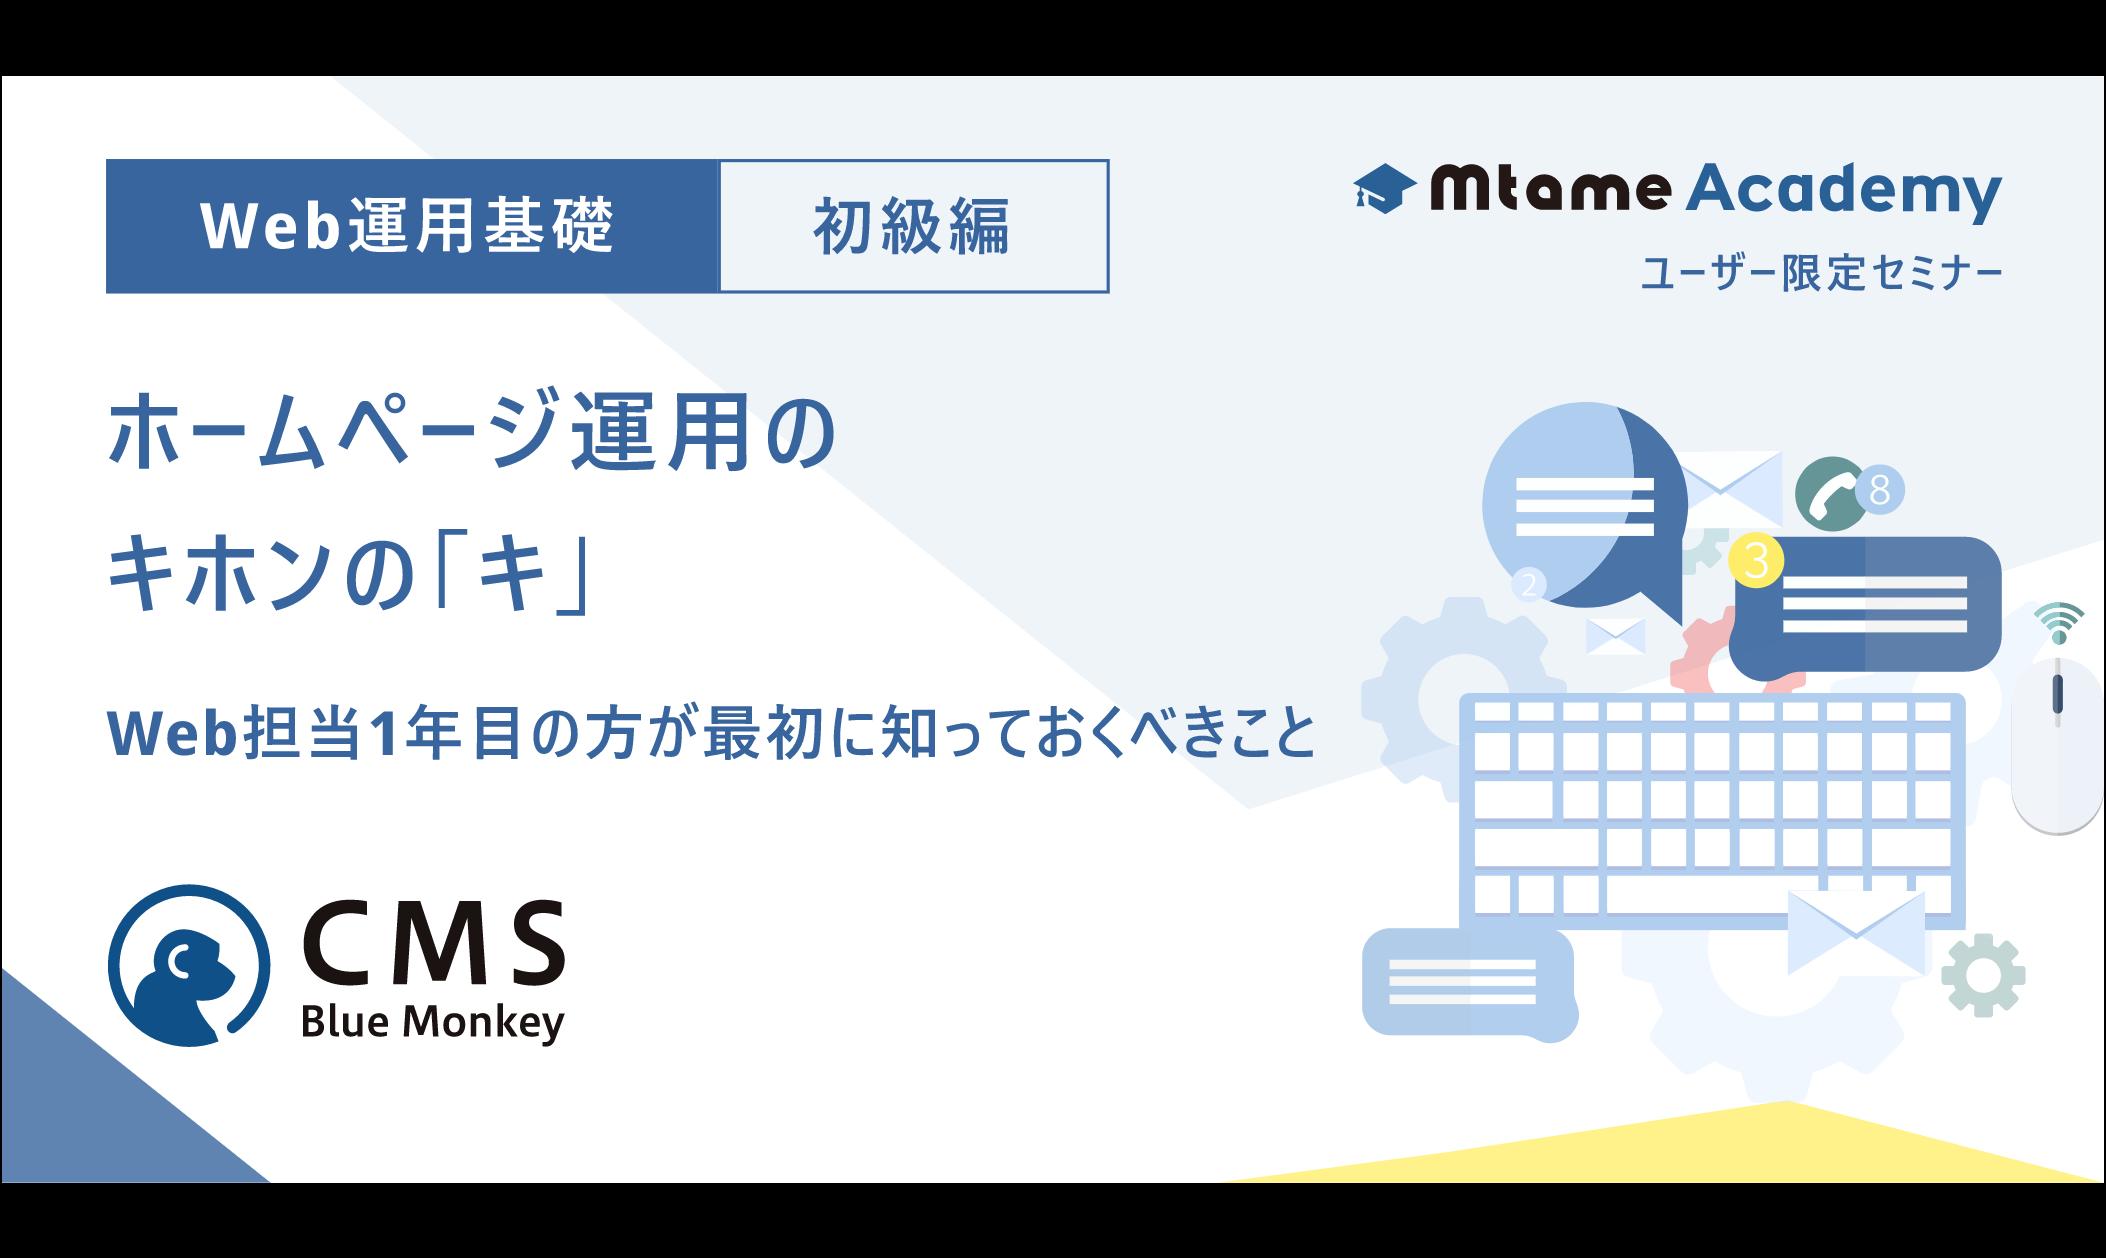 【Web運用基礎:初級編】ホームページ運用のキホンの「キ」〜Web担当1年目の方が最初に知っておくべきこと〜